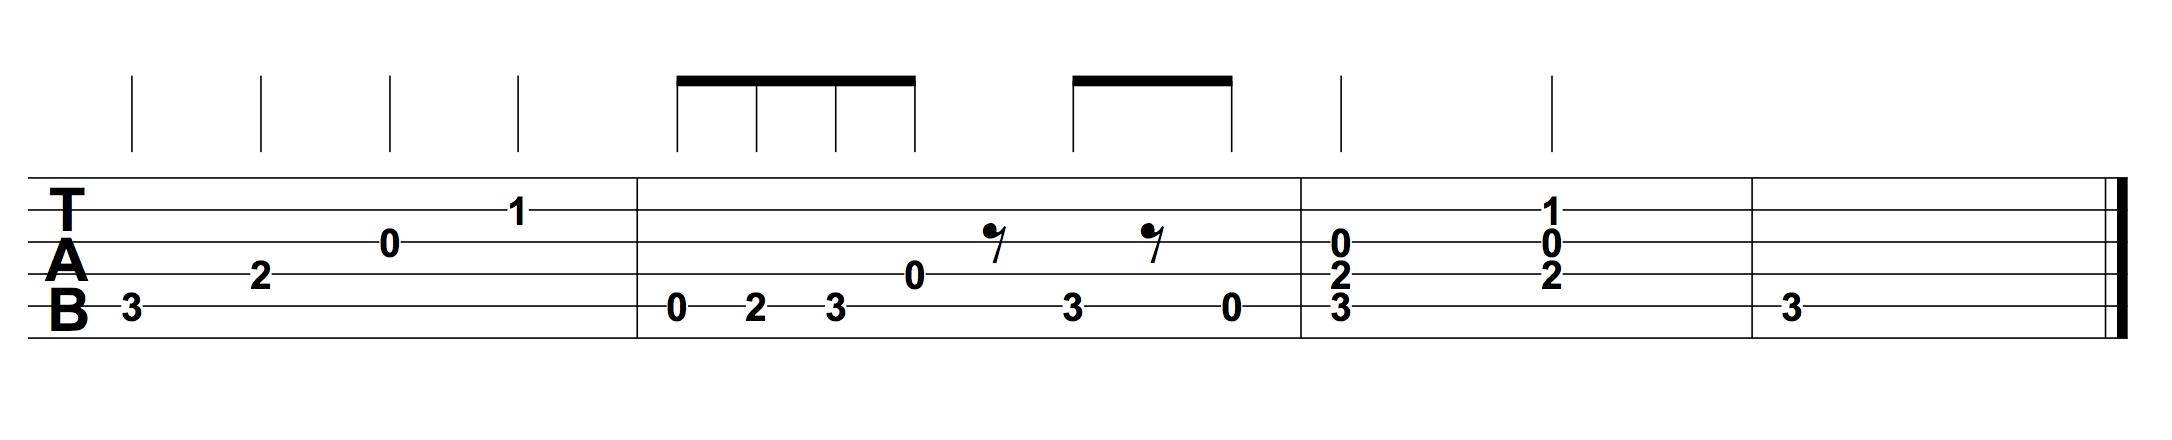 How To Read Guitar Tab | Hub Guitar